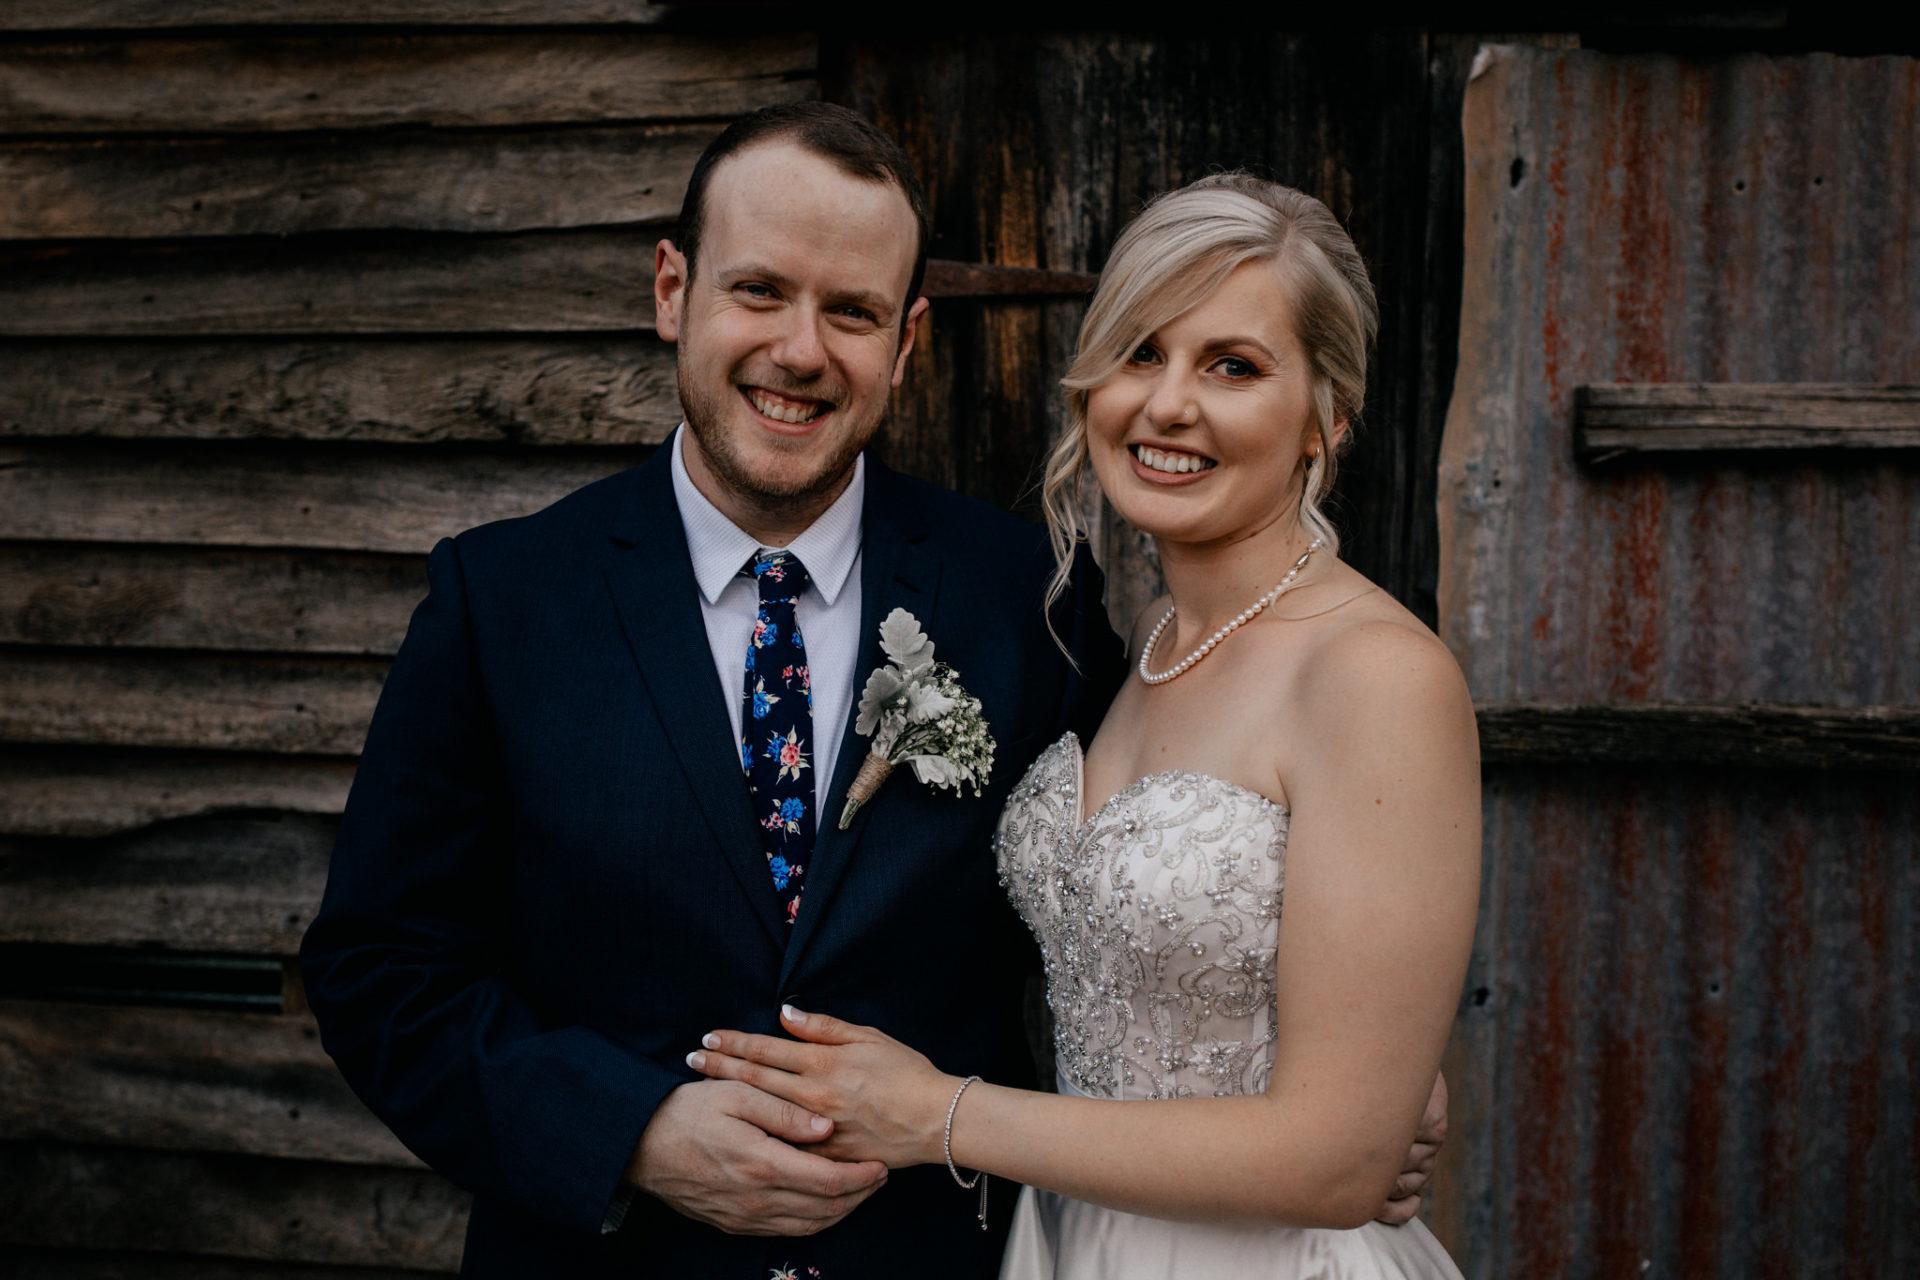 backyard-wedding-australia-melbourne-bride-bridesmaid-portrait-bridal-party